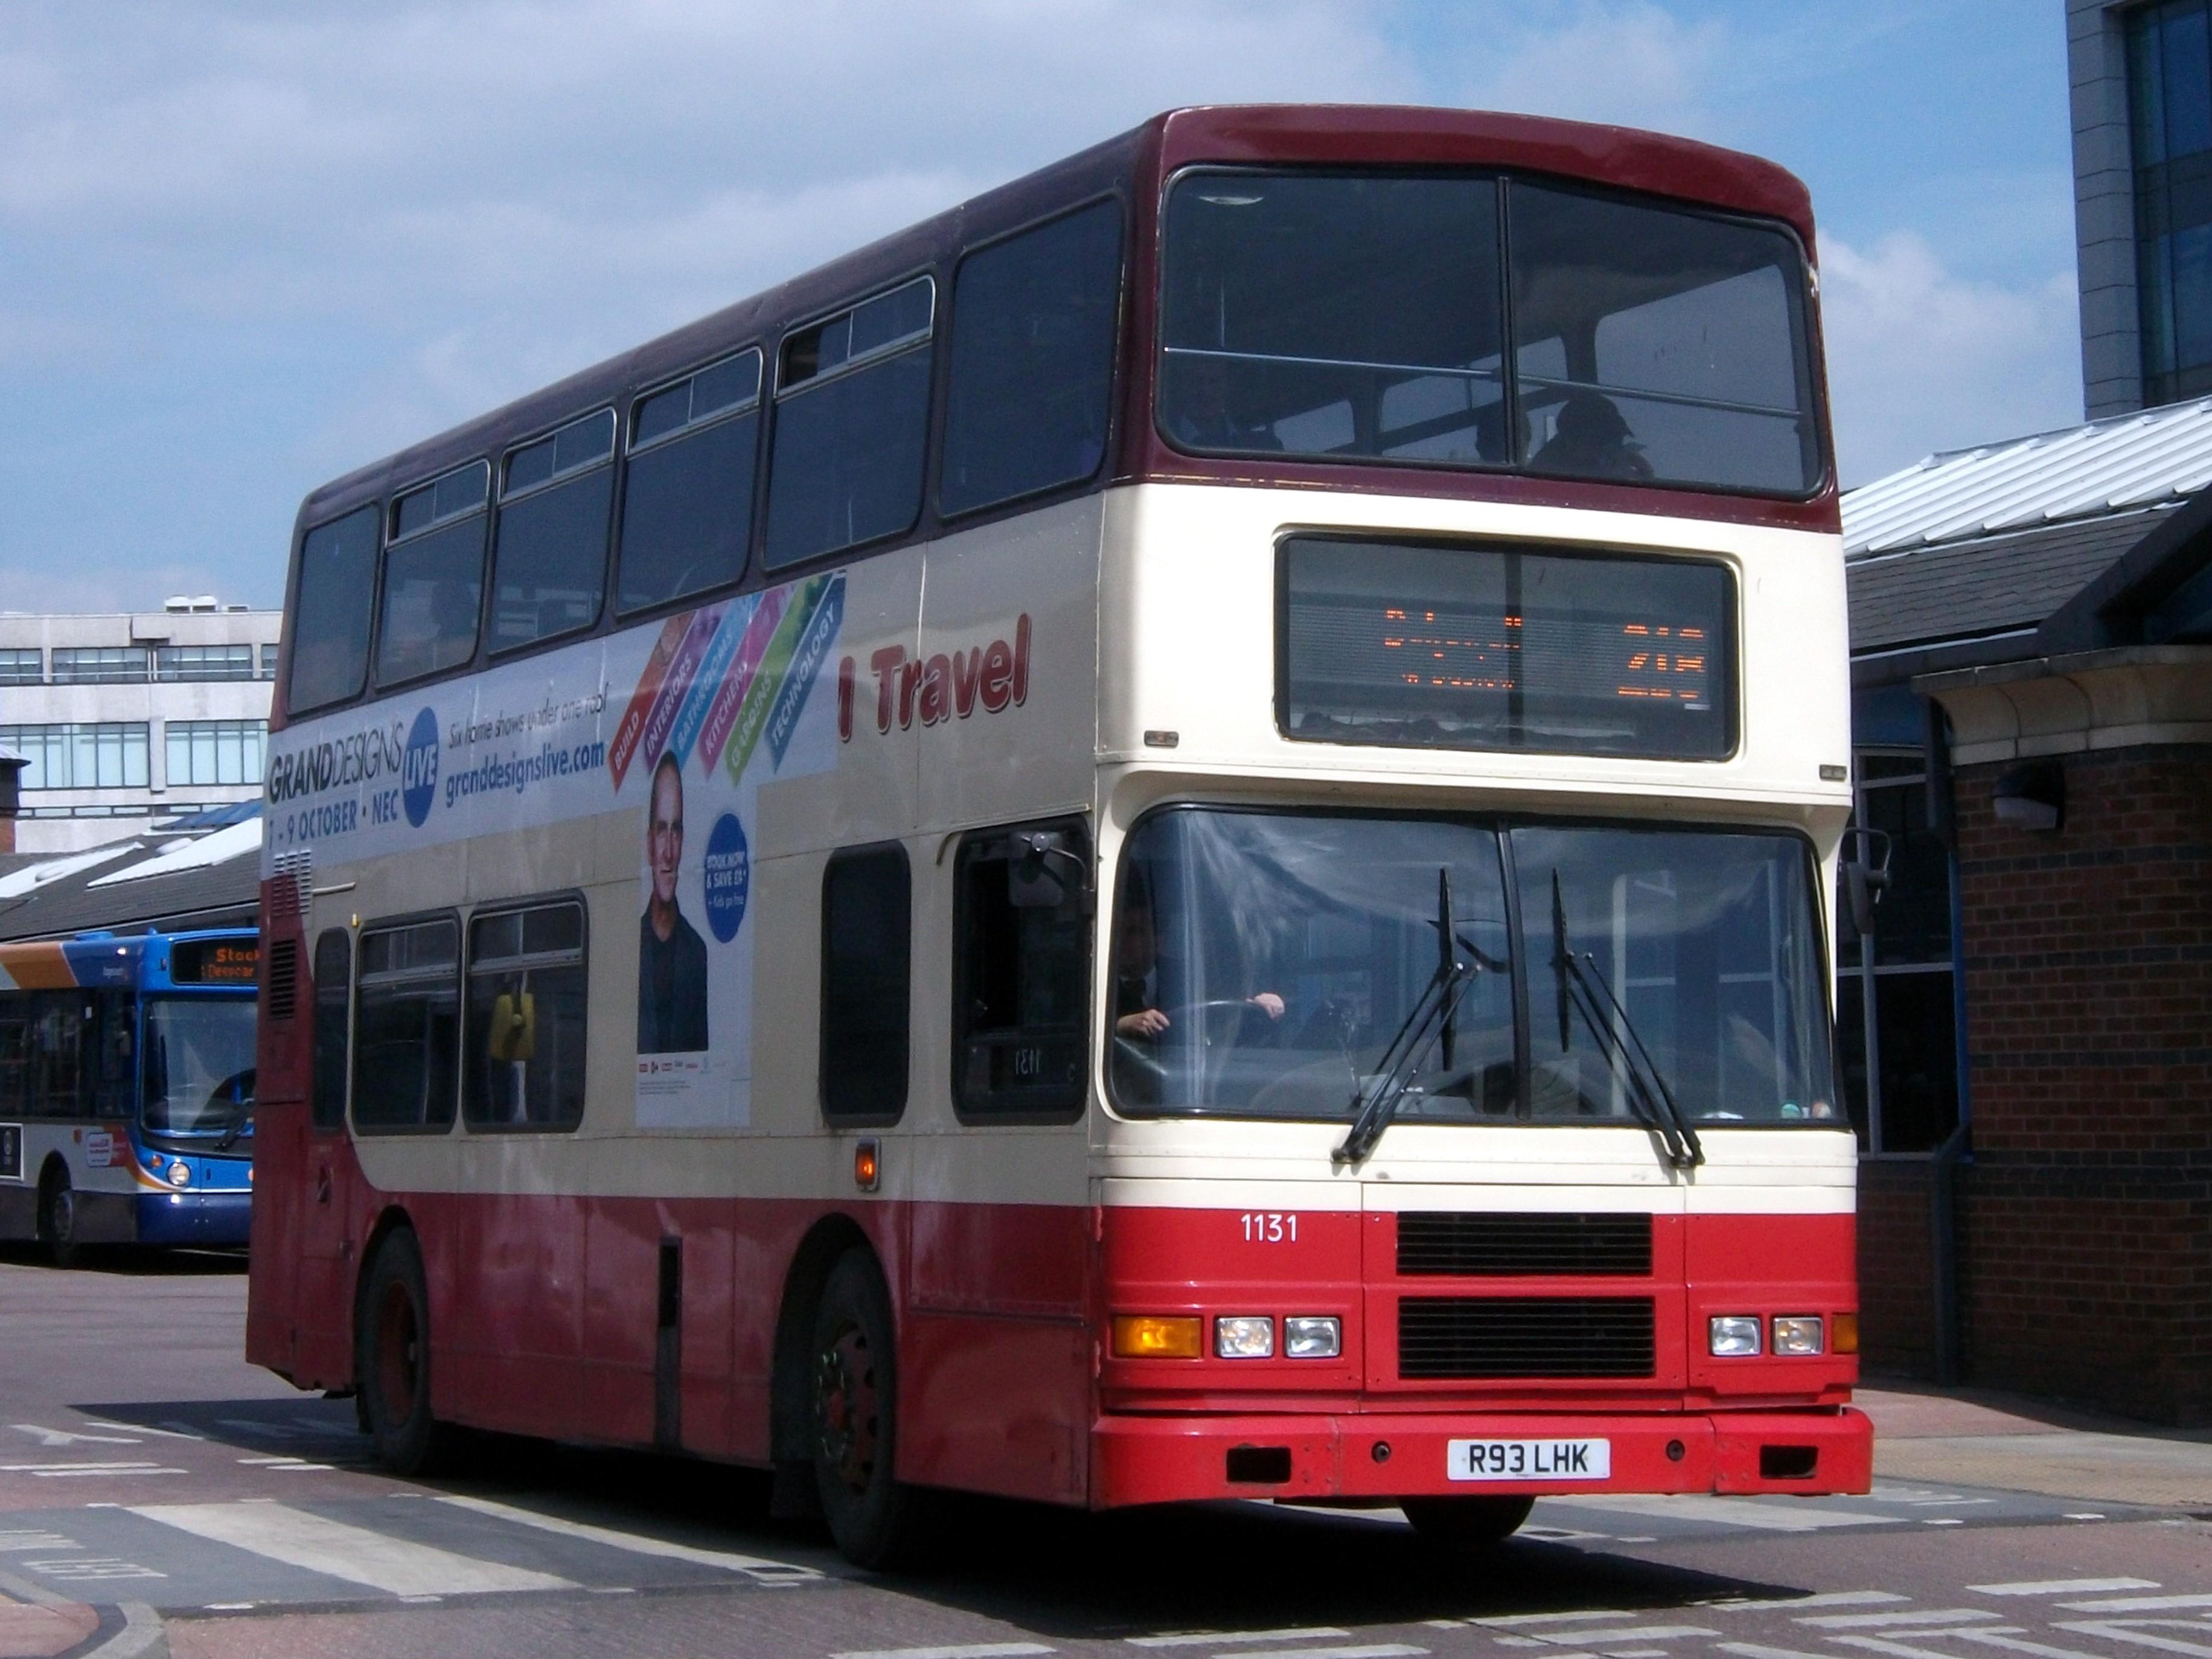 File:TM Travel, Volvo Olympian Alexander RH (1131, R93 LHK) (